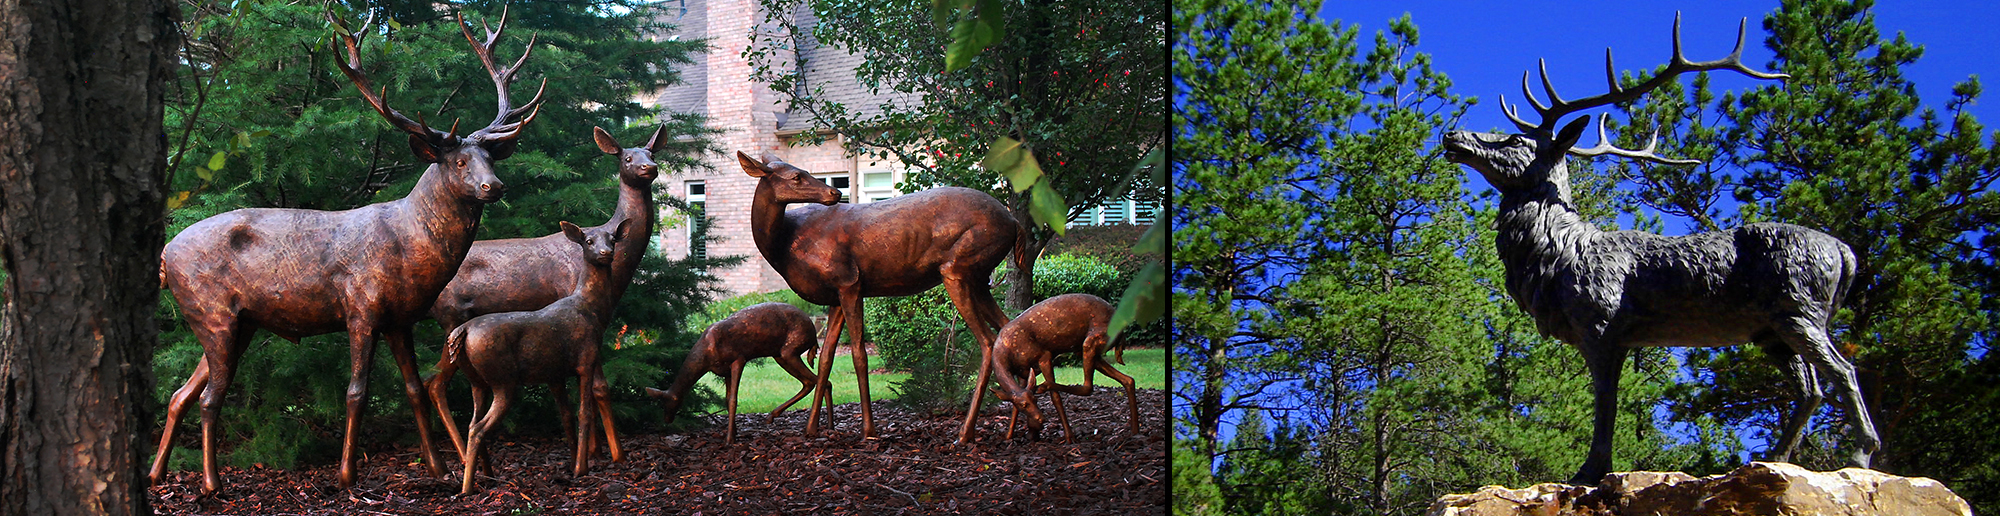 Bronze-Deer-Family-of-Six-and-Majestic-Elk-by-Metropolitan-Galleries-Inc